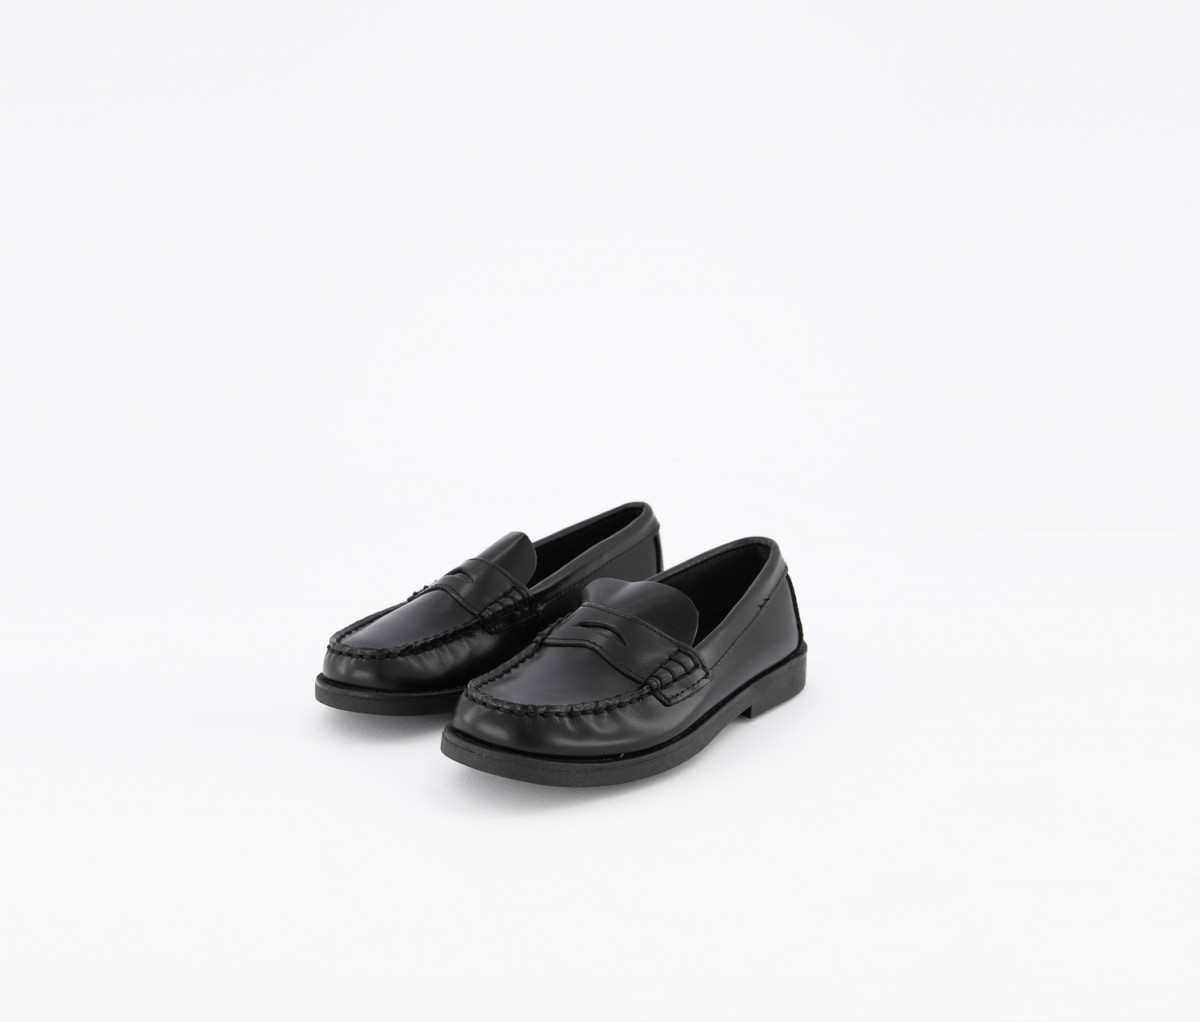 Sperry Kids Boys Colton Shoes  Black